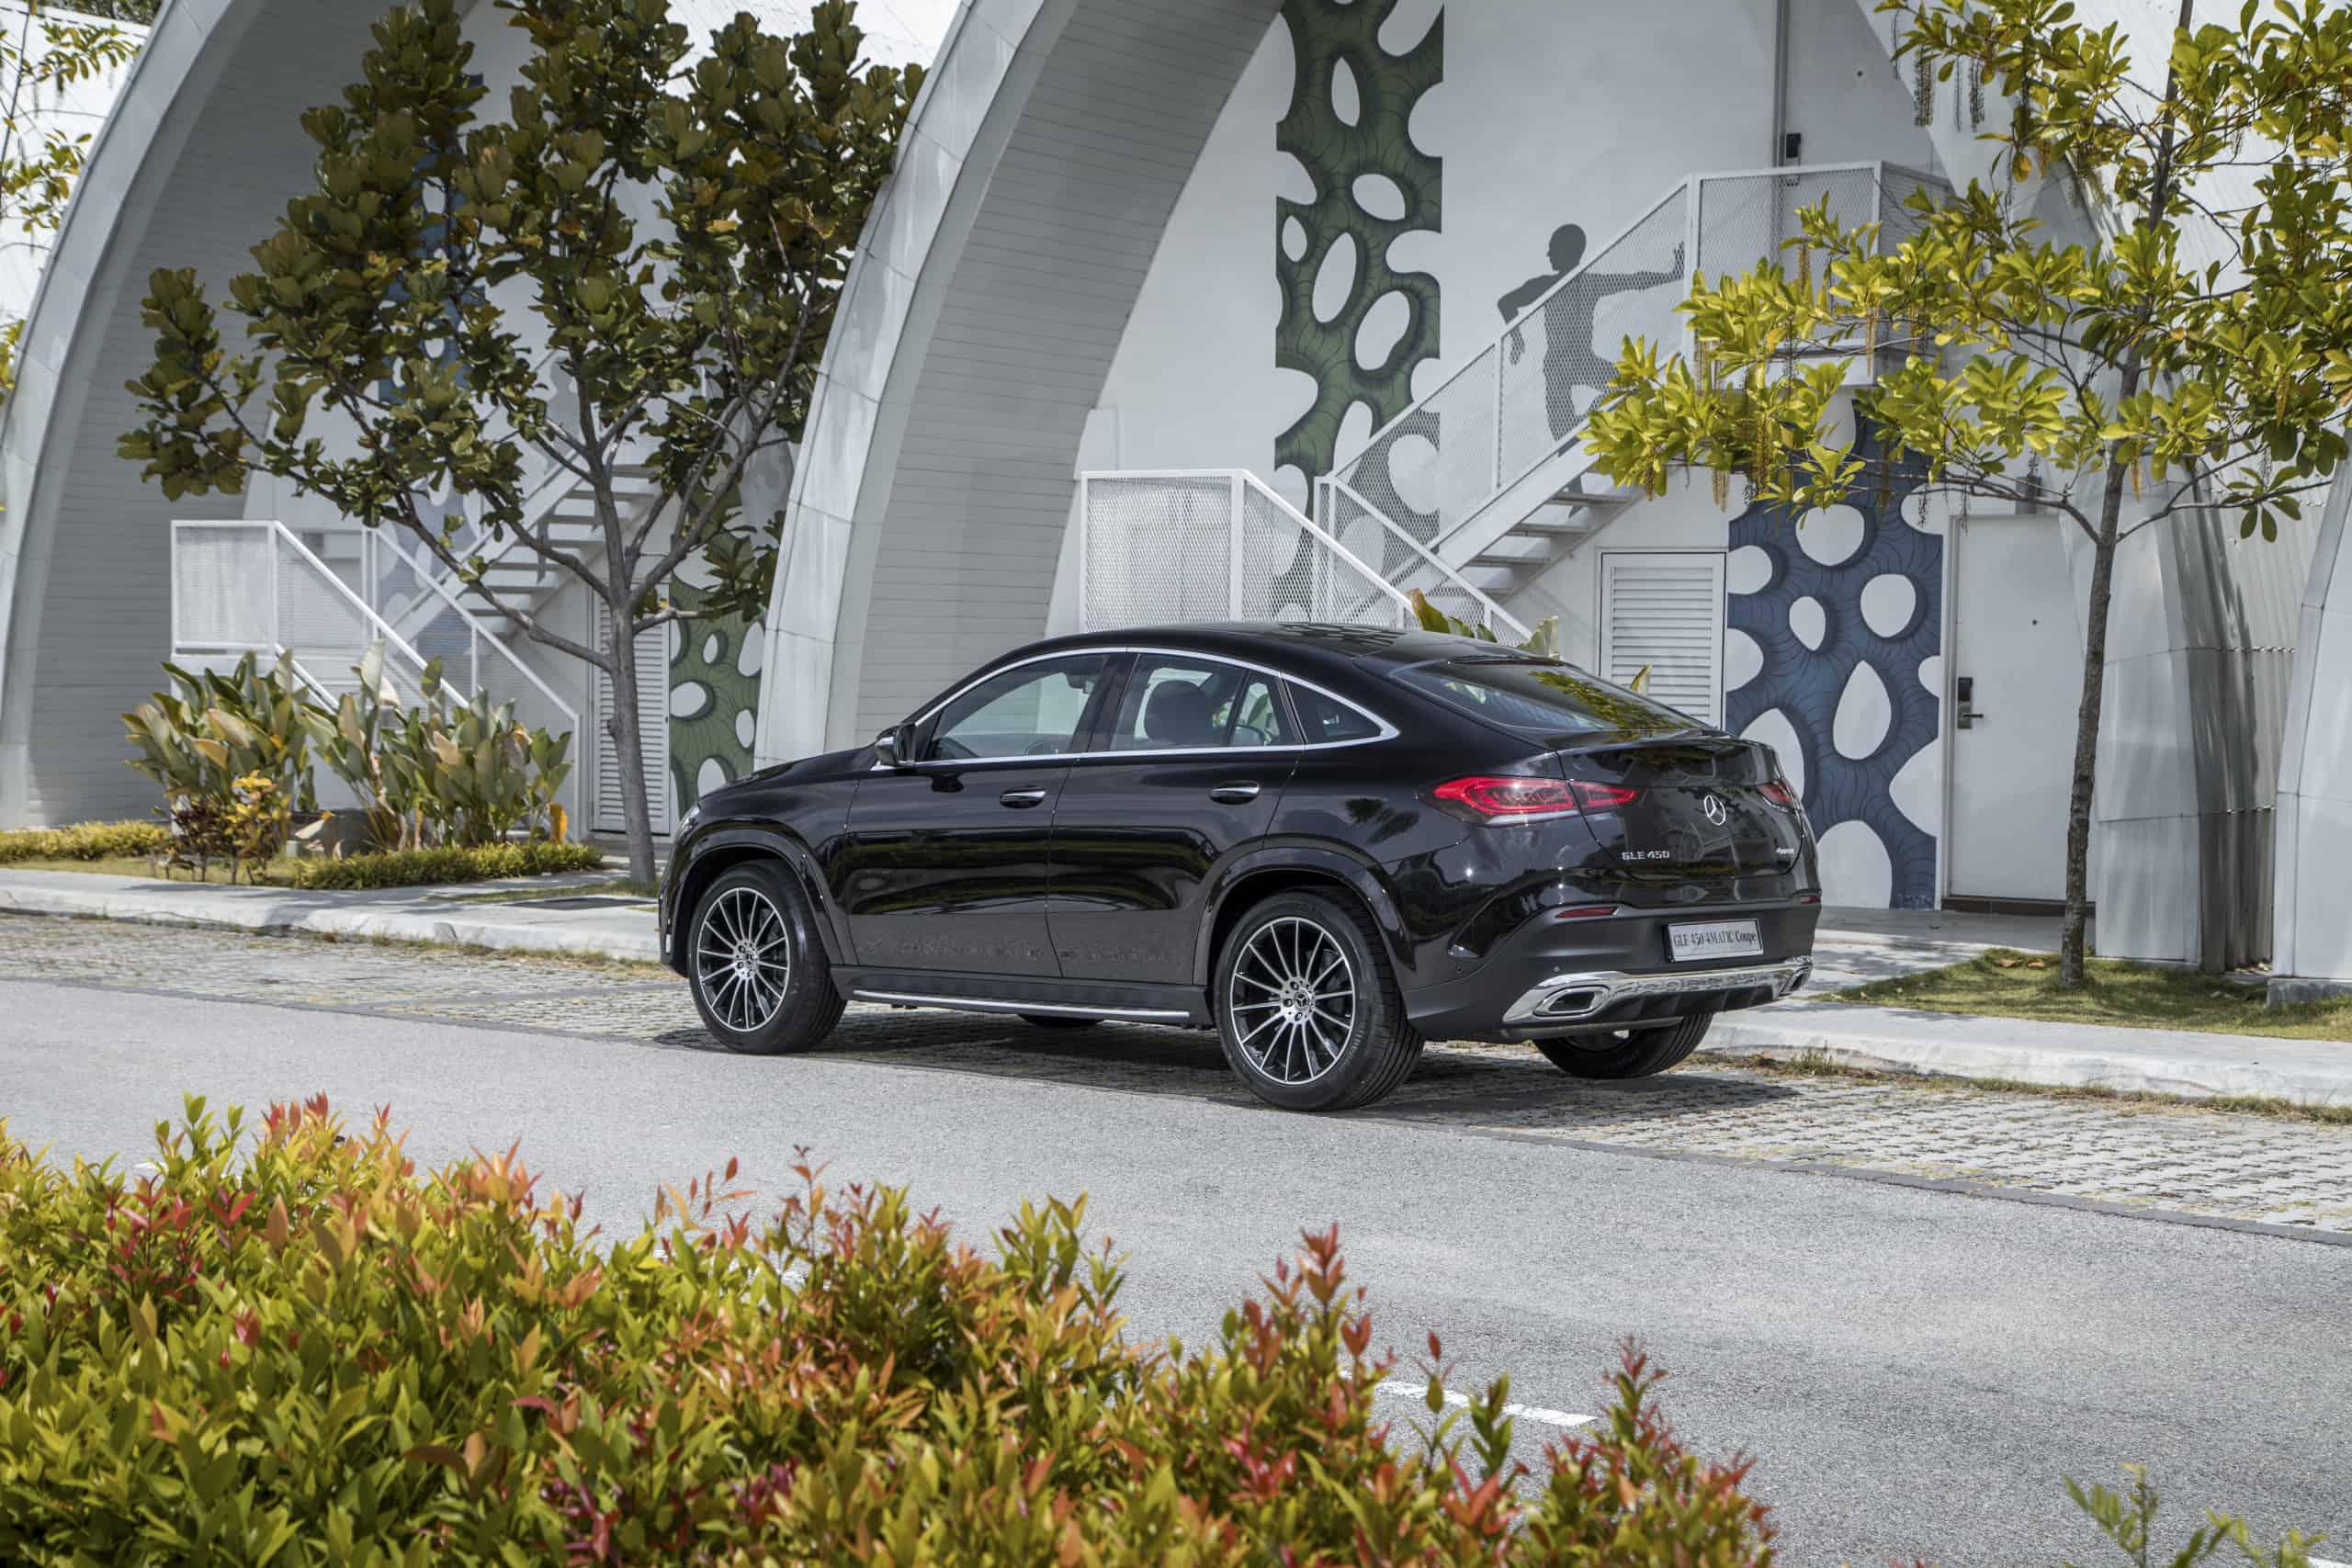 Mercedes_Benz_Malaysia_GLE450_4Matic_Coupe exterior 2